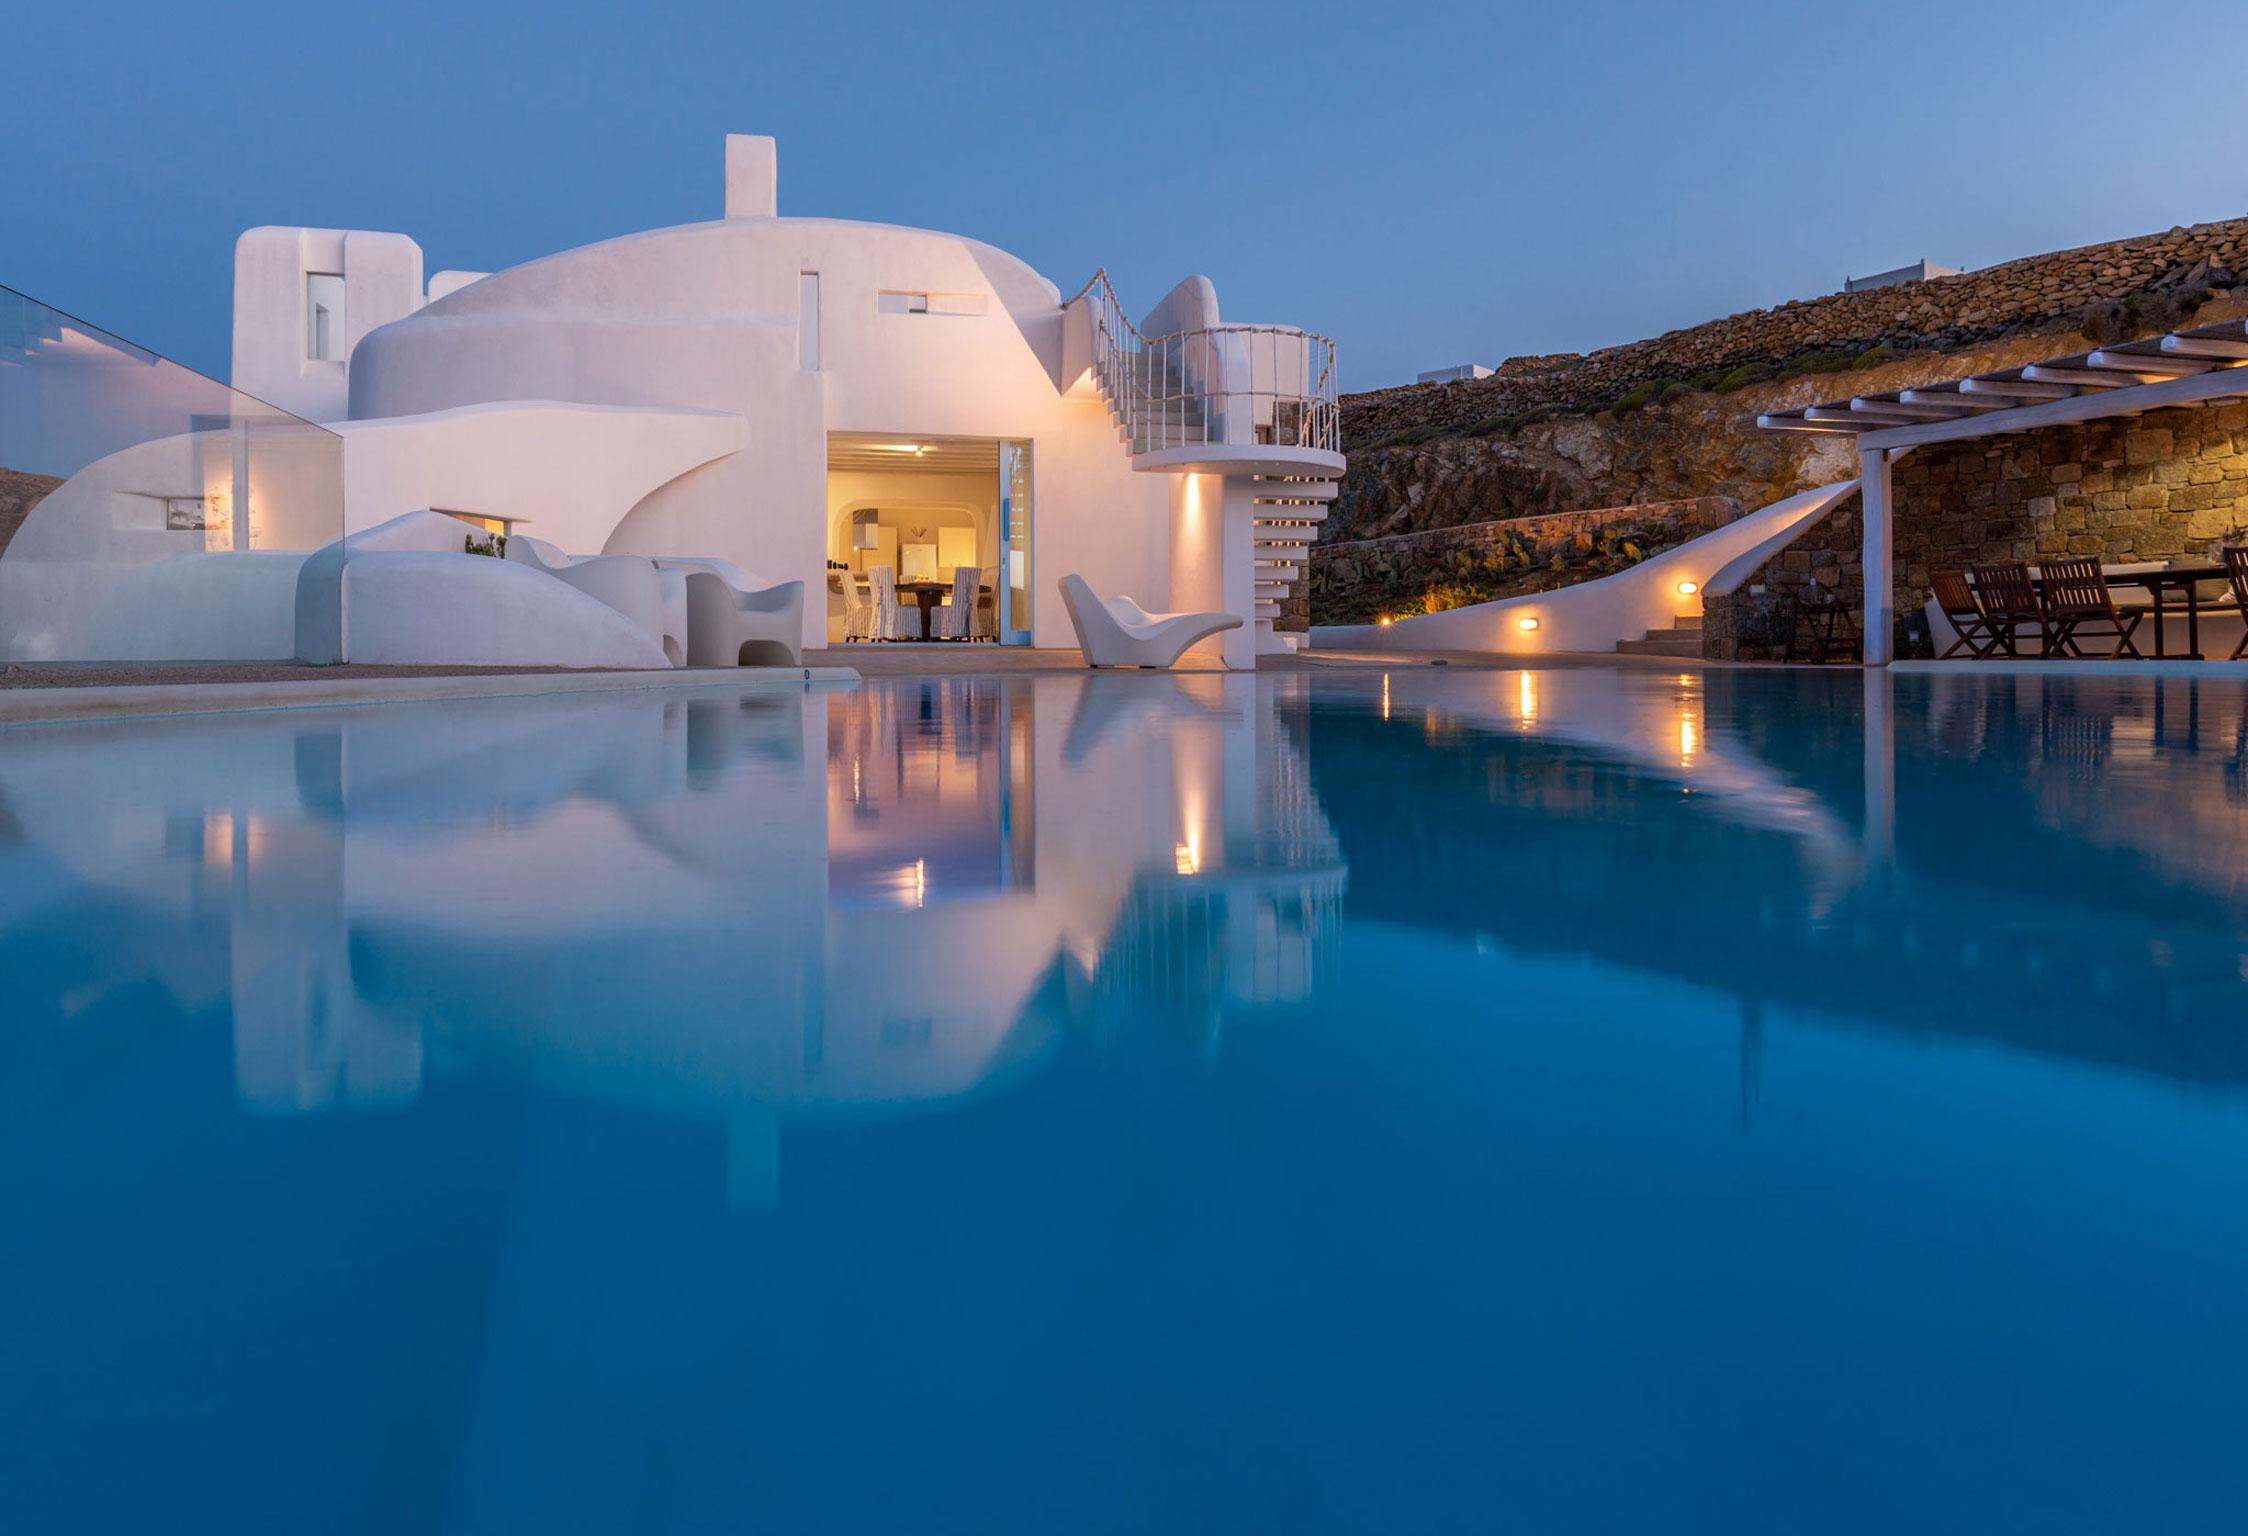 Mykonos Villa Alcestis jumbotron image